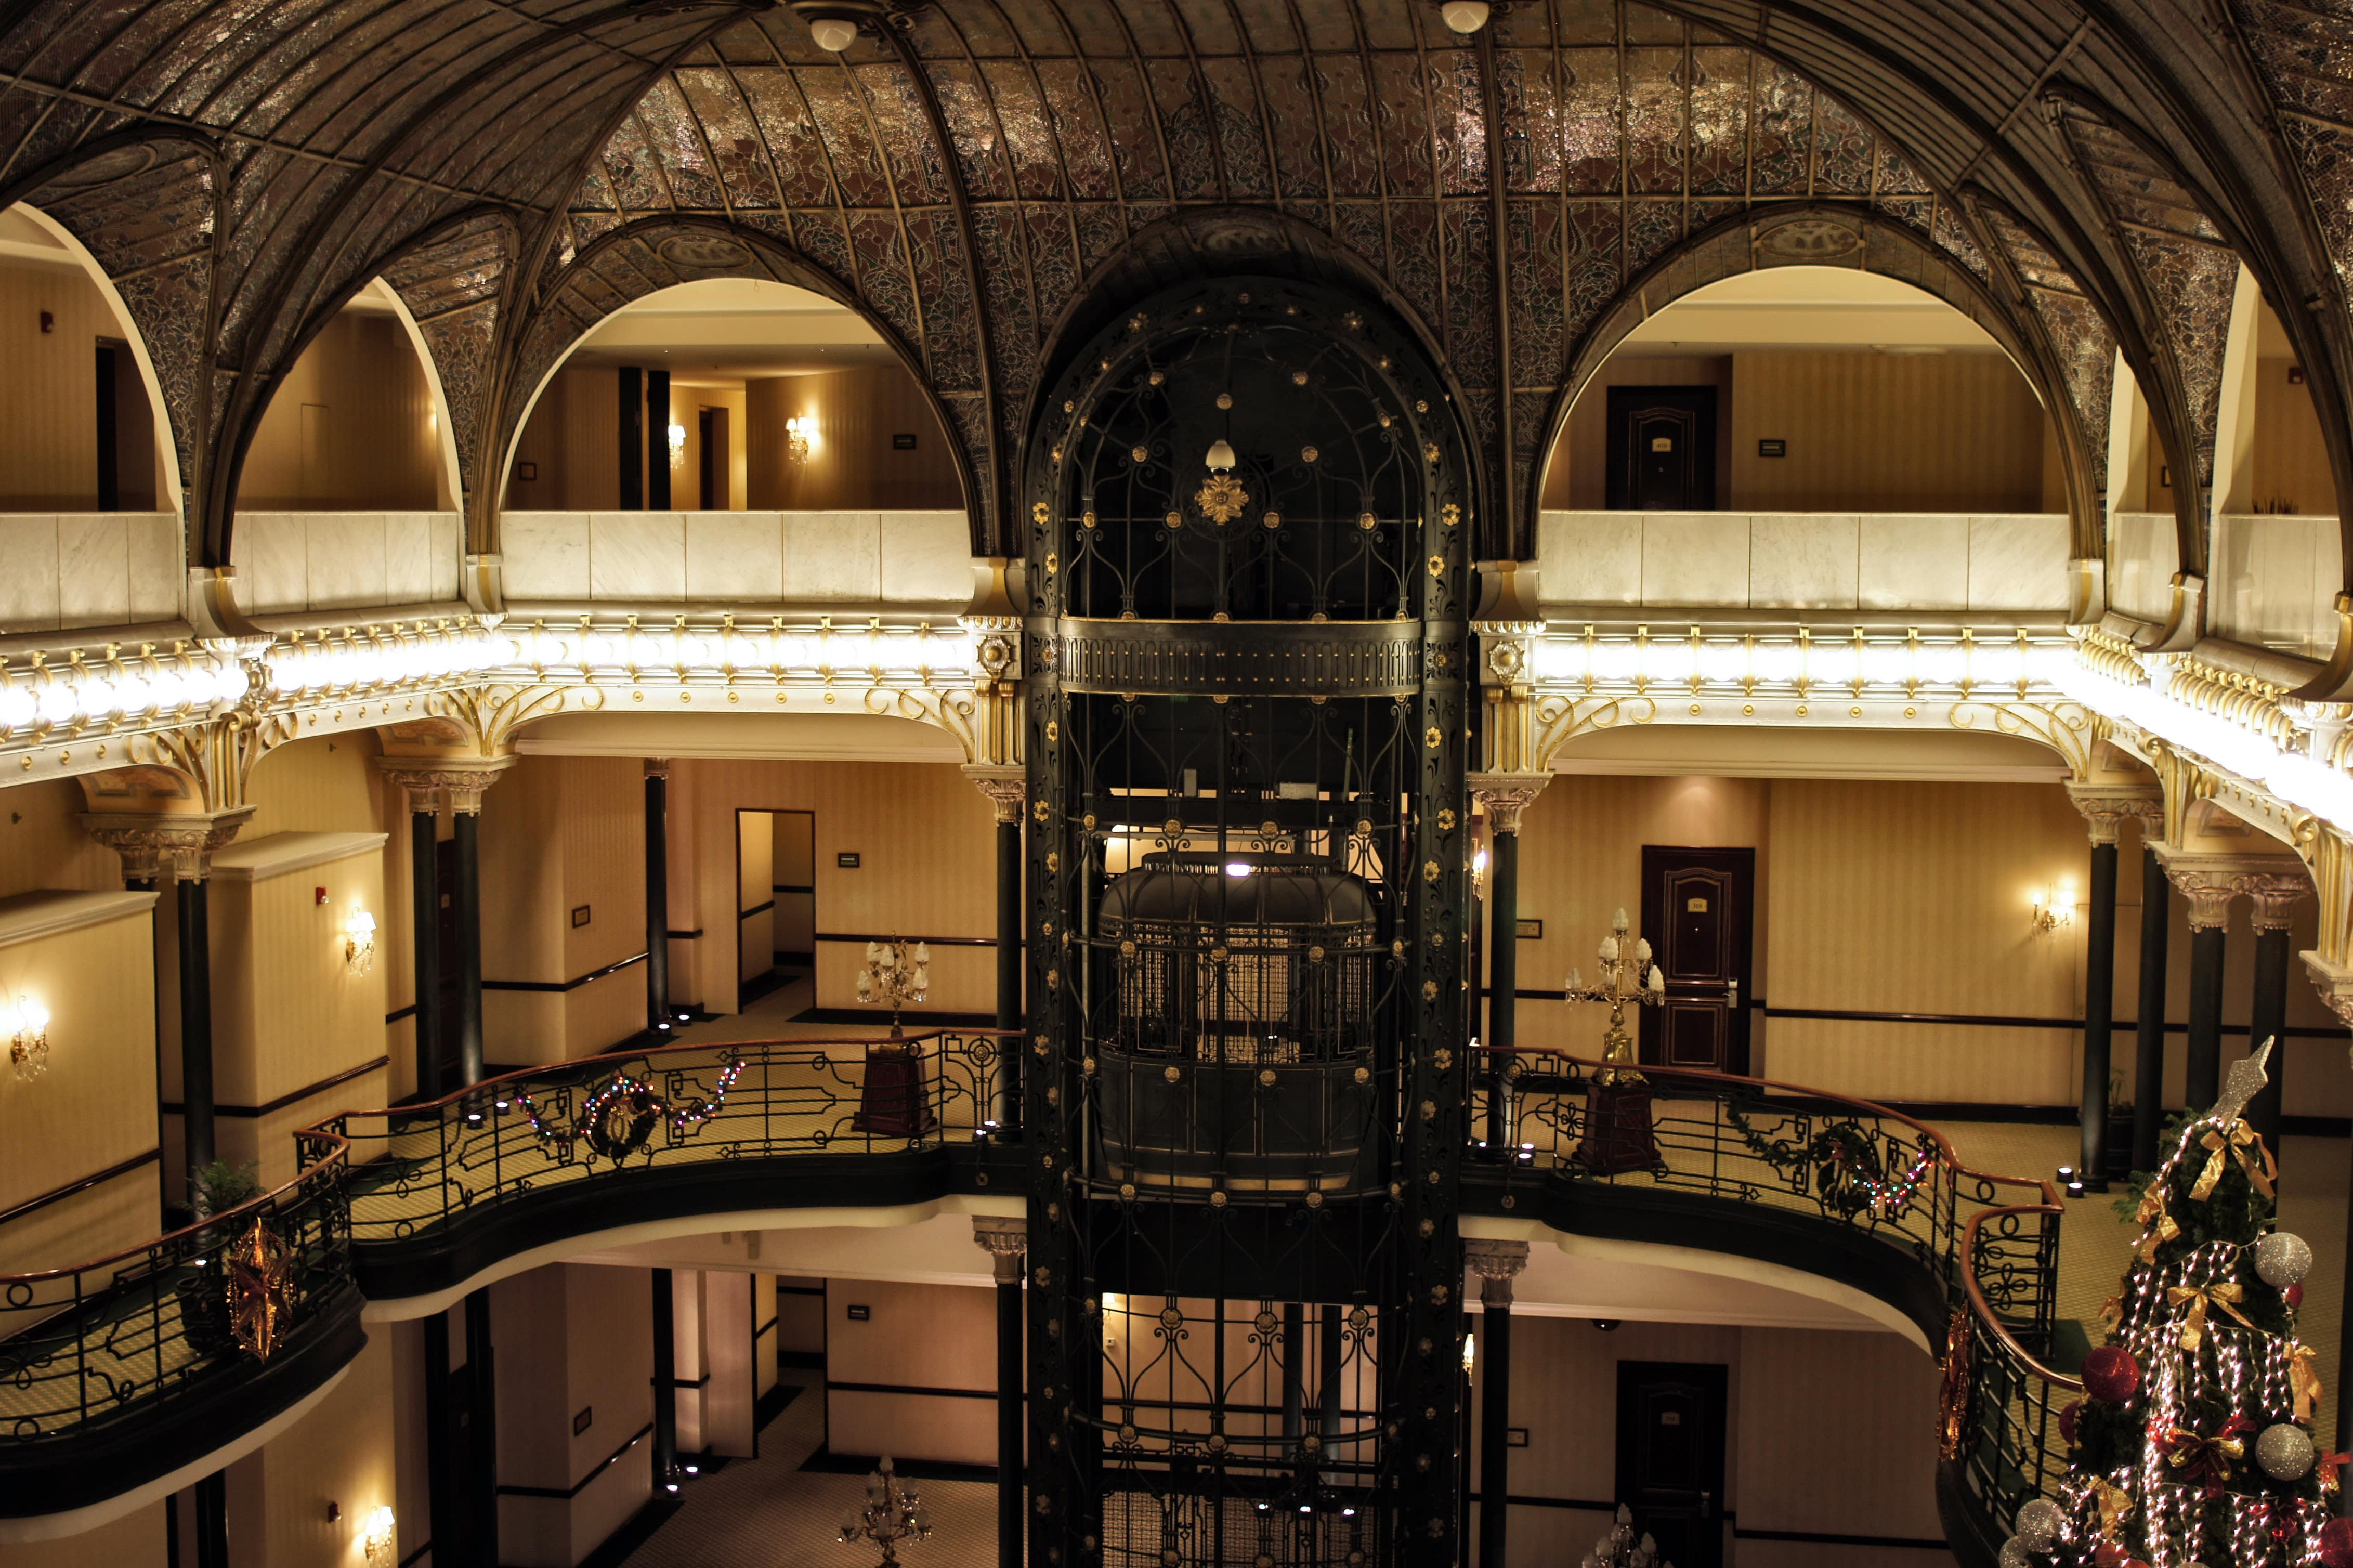 Gran Hotel | © www.haaijk.nl/Flickr